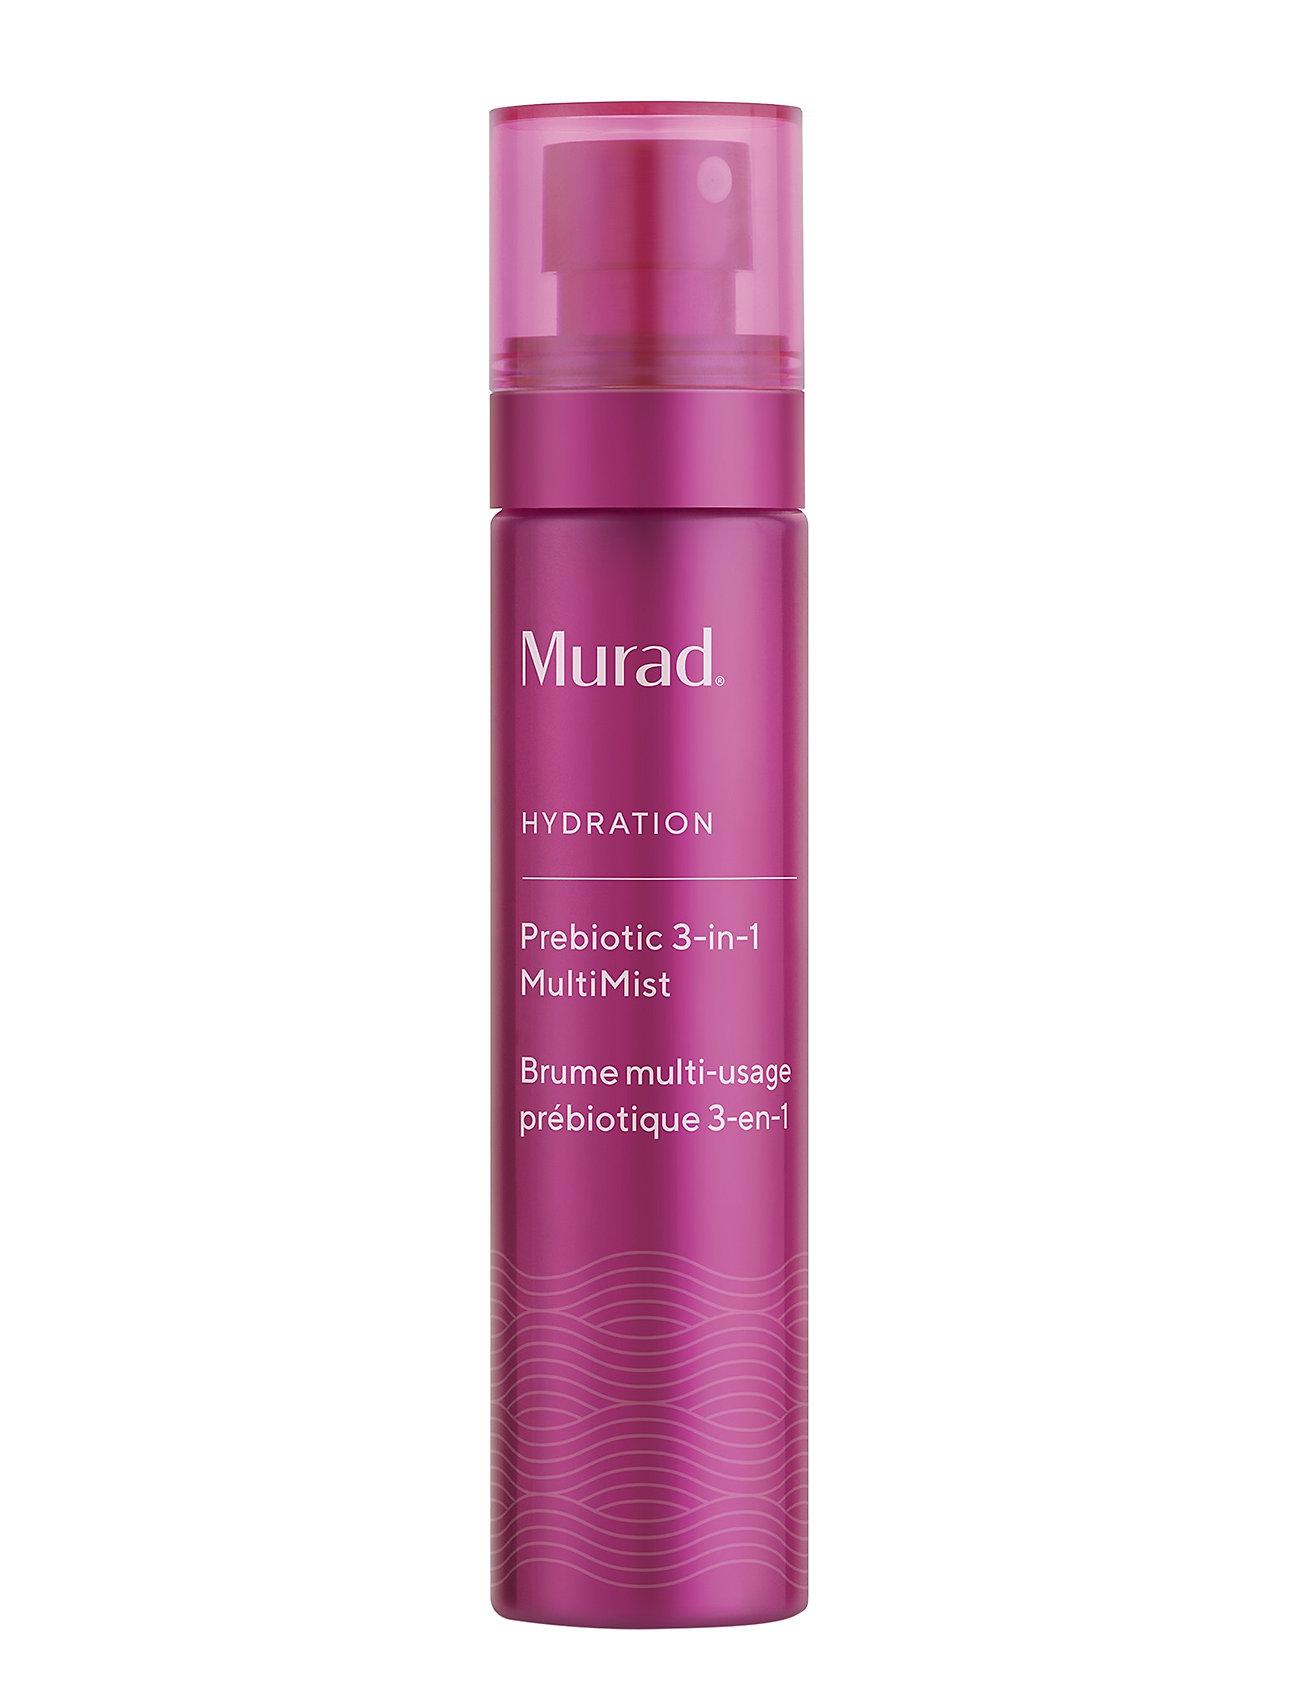 Image of Prebiotic 3-In-1 Multimist 100 Ml Beauty WOMEN Skin Care Face Face Mist Nude Murad (3232787353)